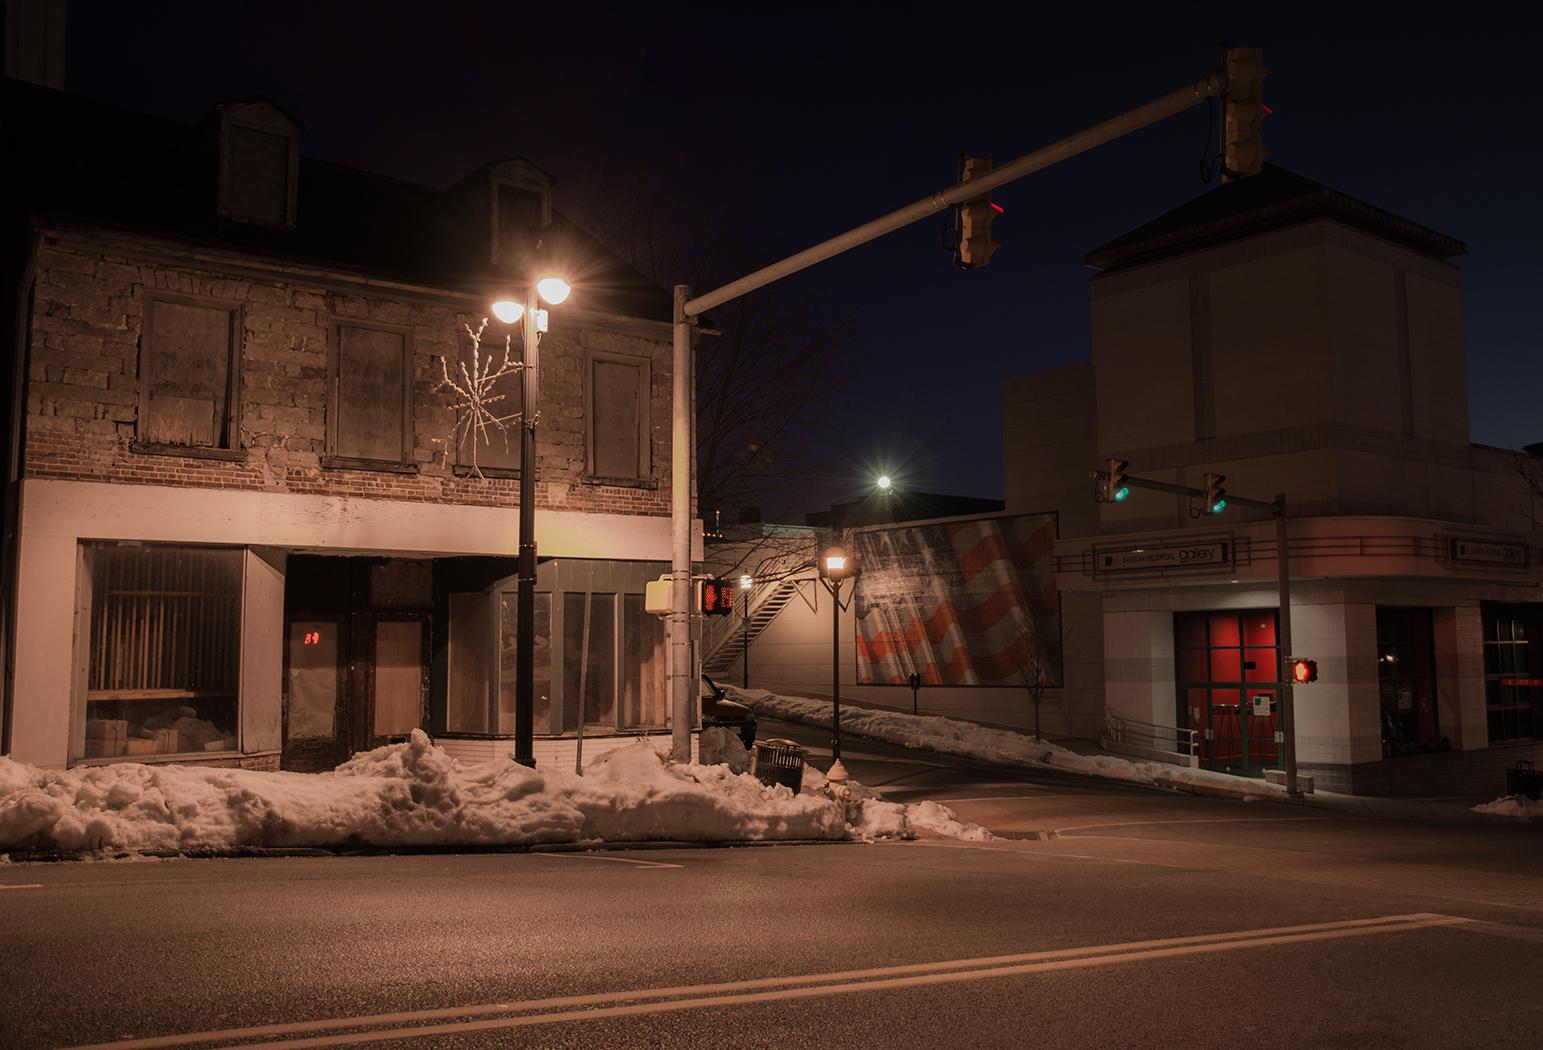 gallery,night,easton,pennslvania,dark,long exposure